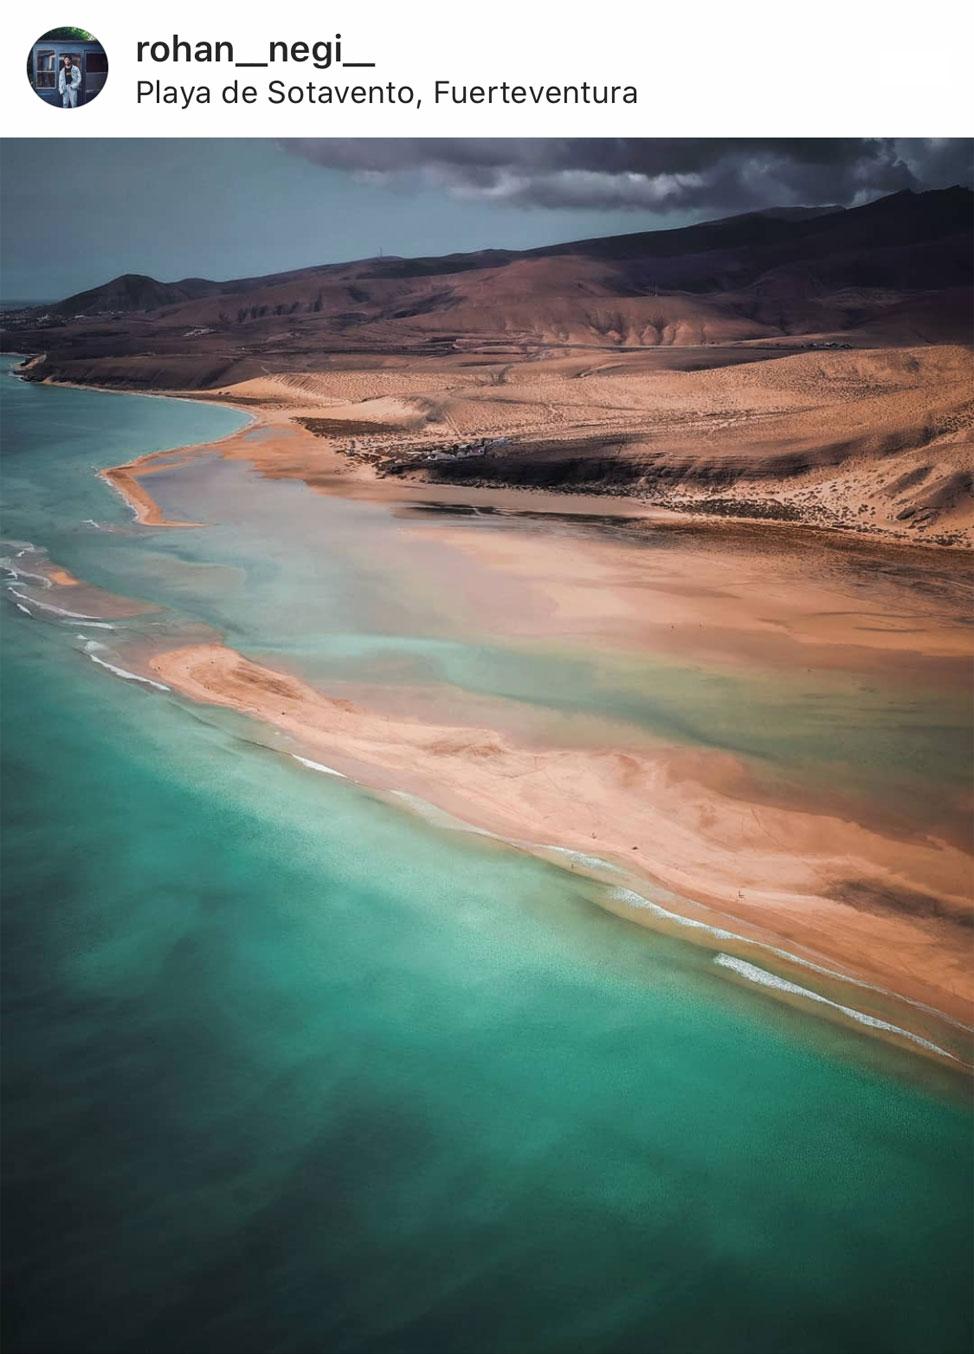 Fuerteventura a vista de pájaro | Macaronesia Fuerteventura